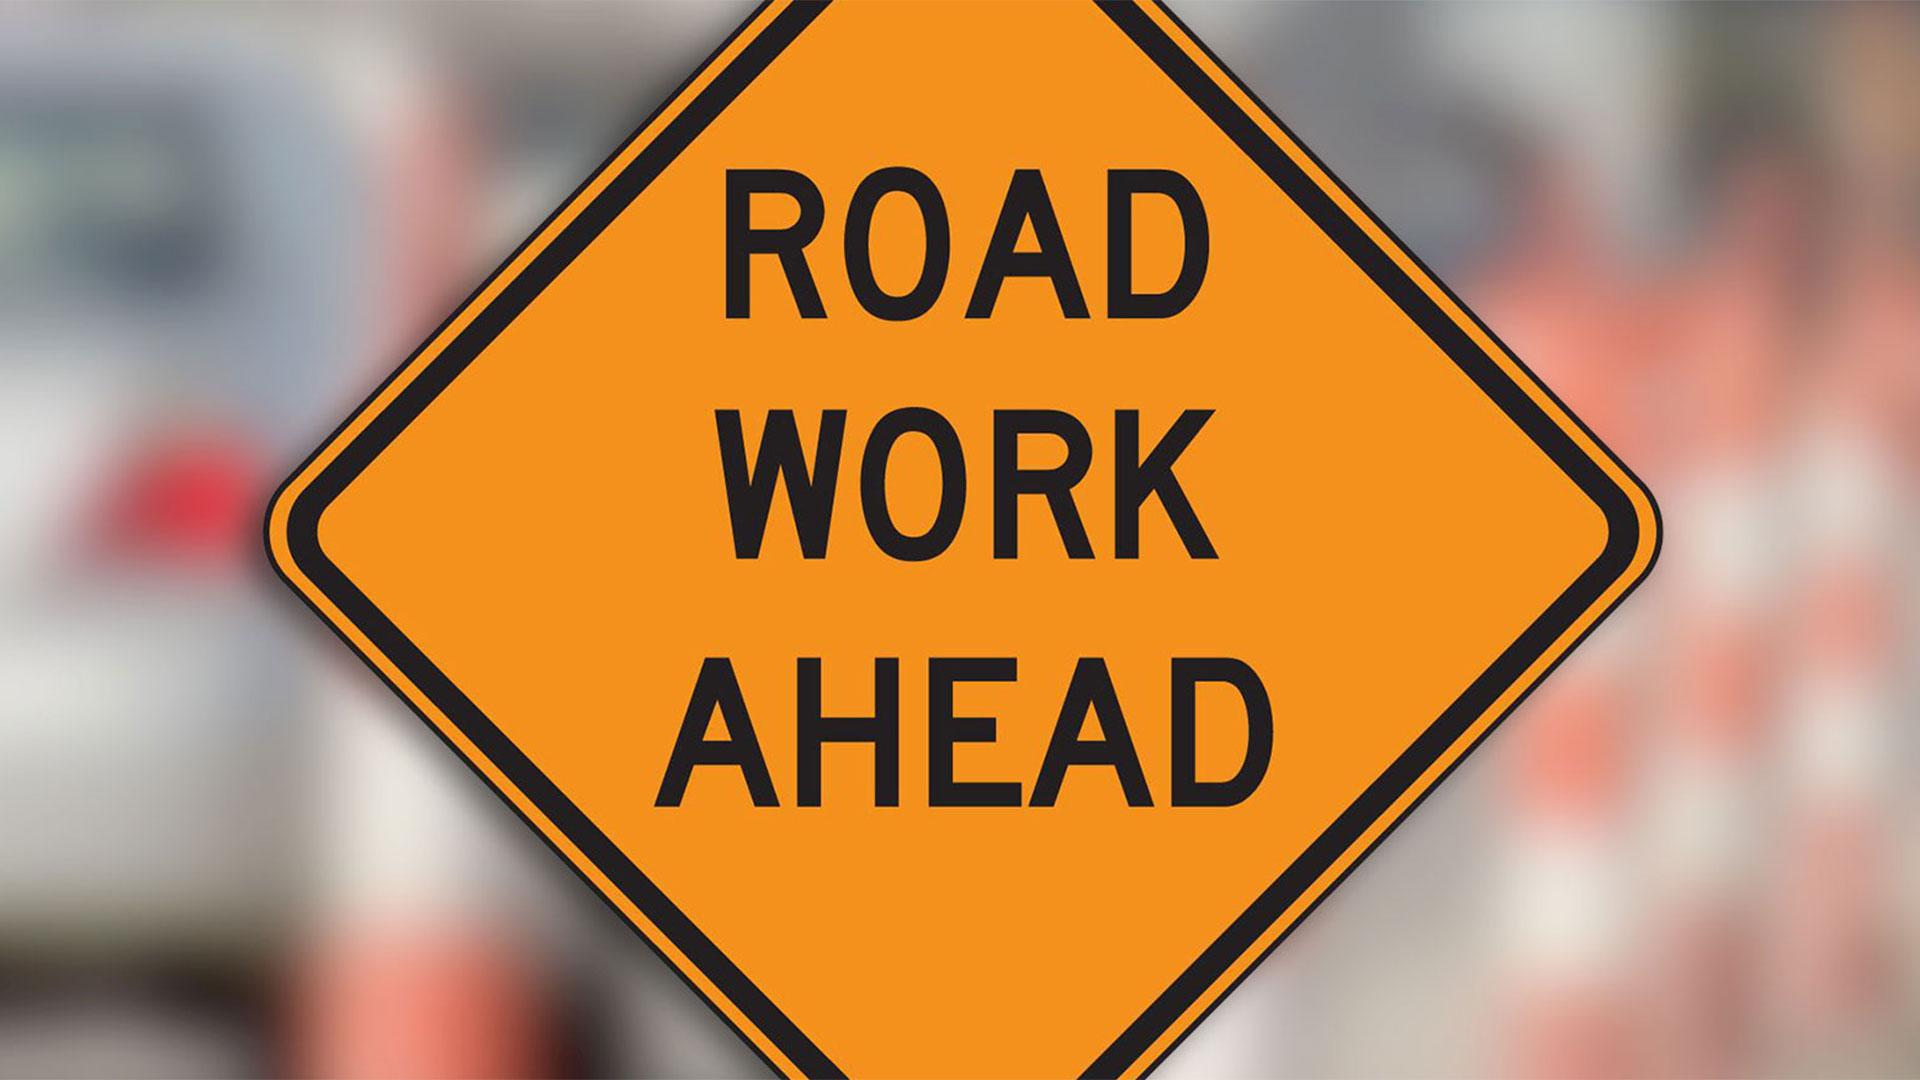 KELO Road work ahead generic construction